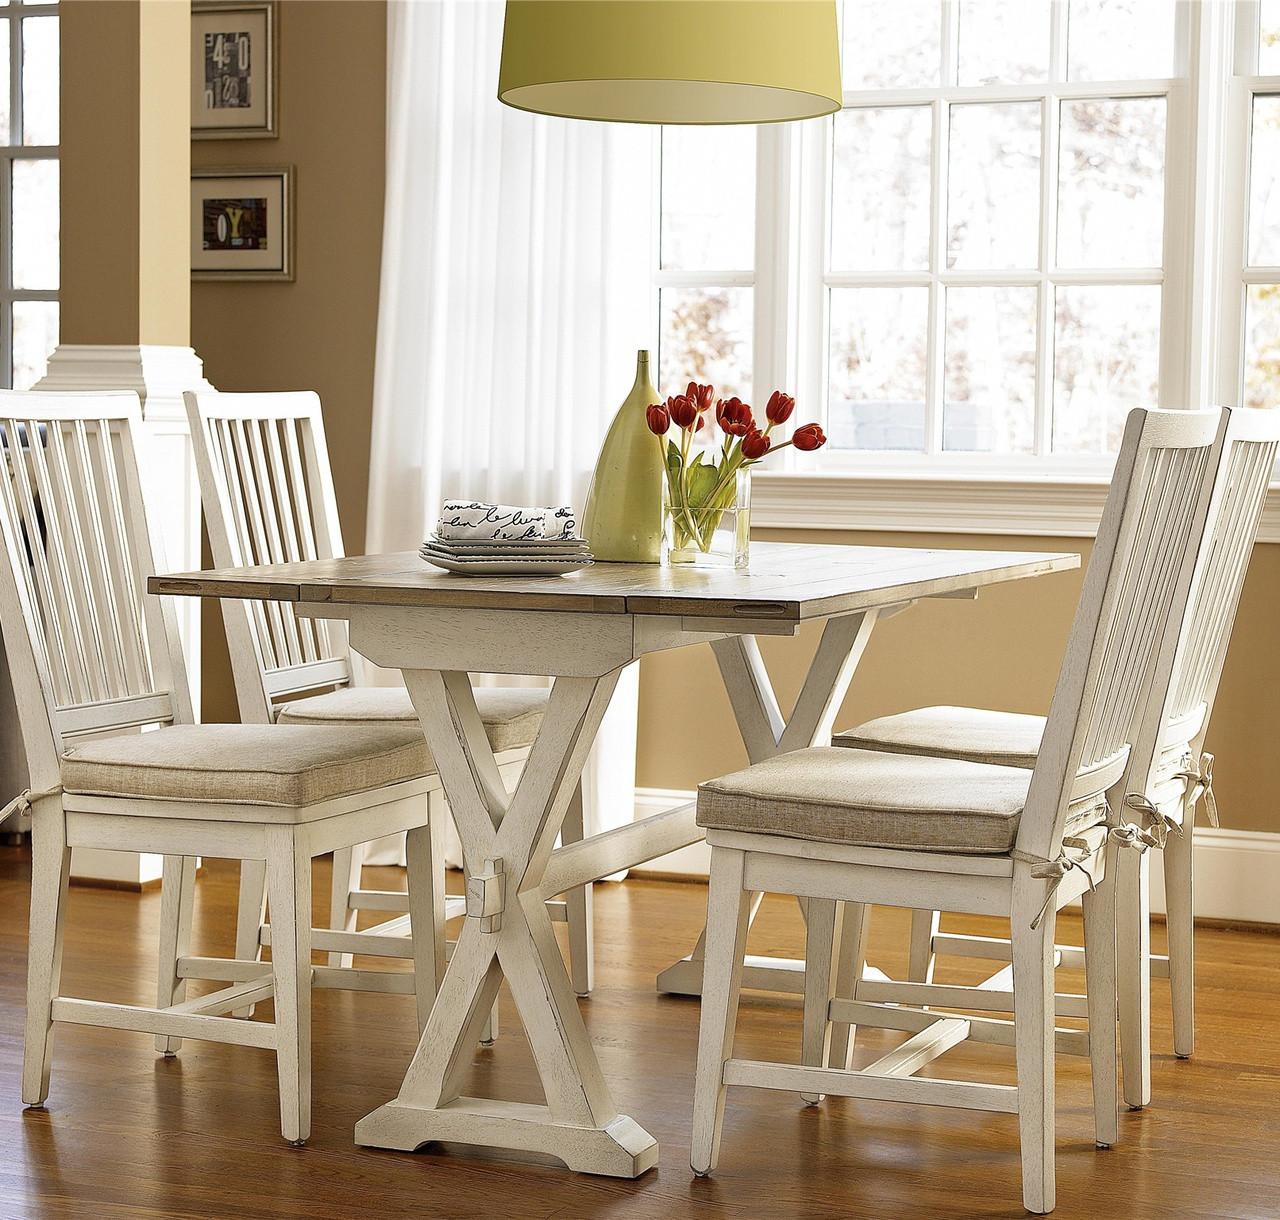 Drop Leaf Kitchen Table: Coastal Beach White Drop Leaf Kitchen Console Table